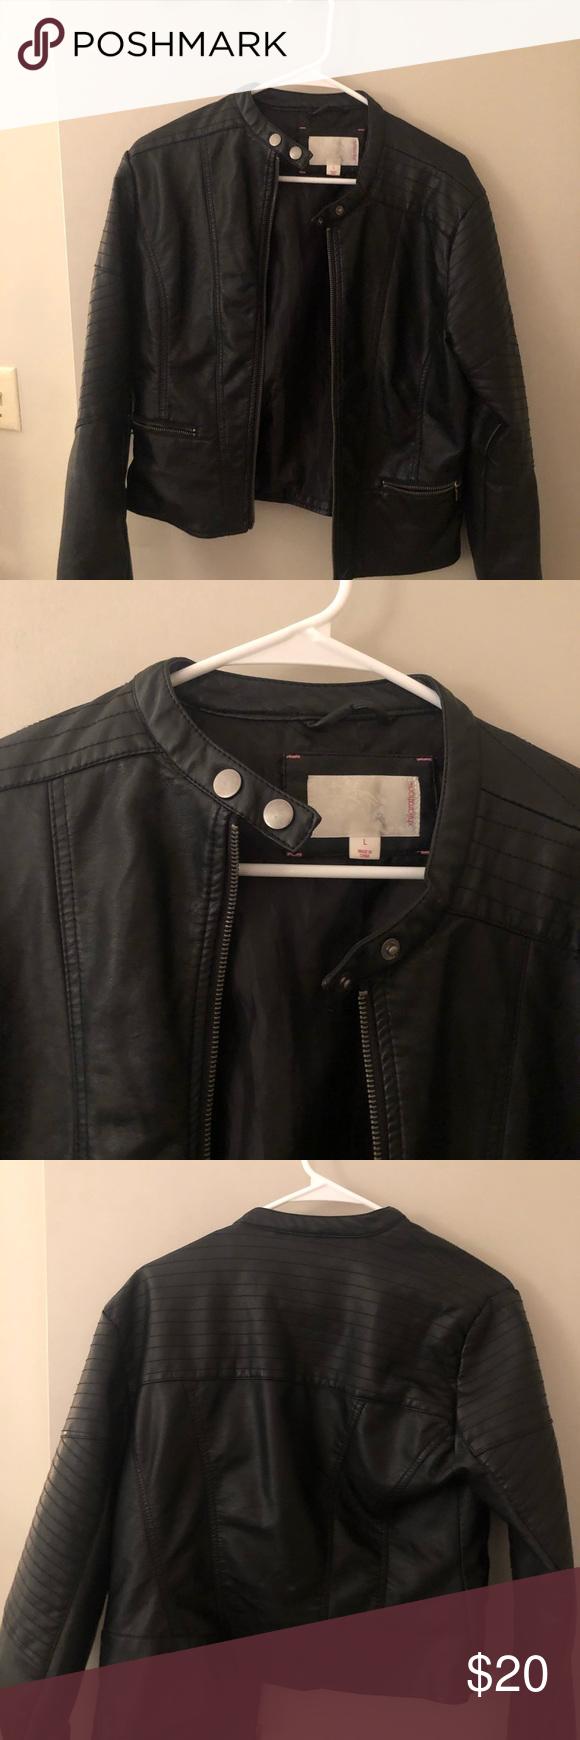 Target Leather Jacket Leather Jacket Cute Leather Jackets Jackets [ 1740 x 580 Pixel ]